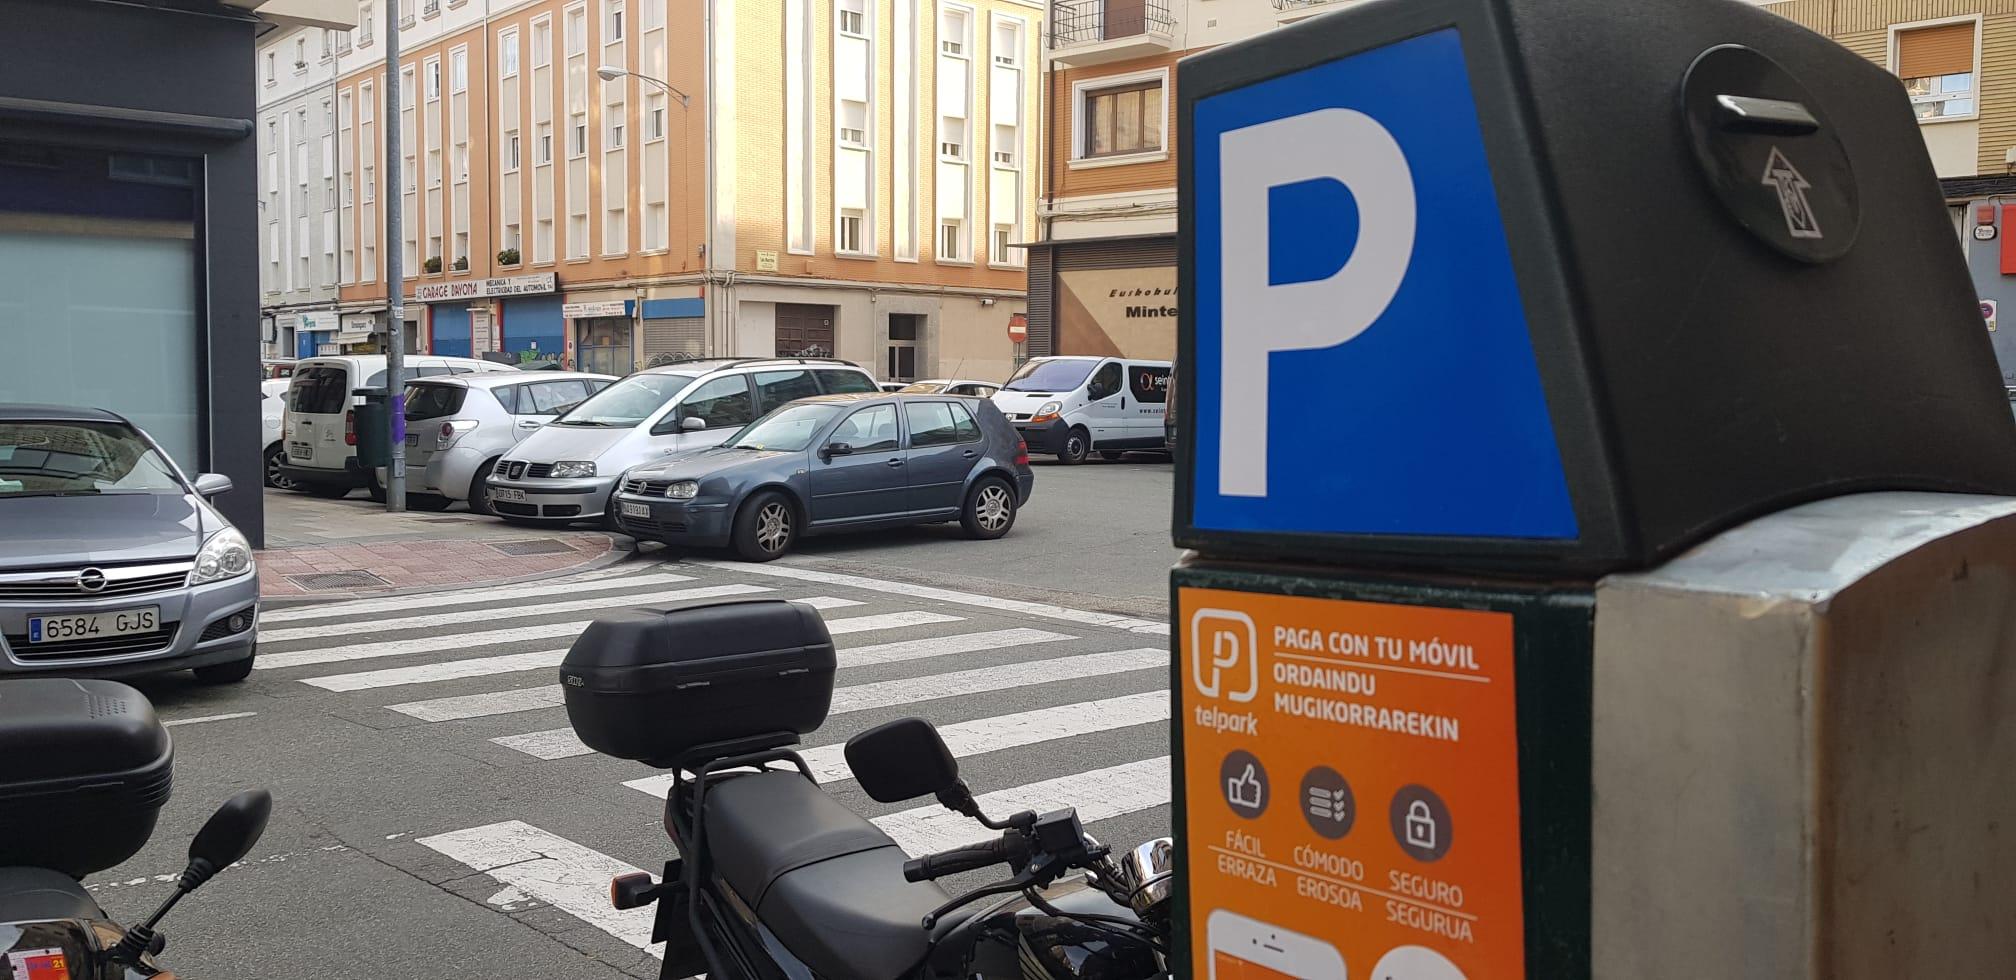 Mendillori-Lezkairu posible parking disuasorio